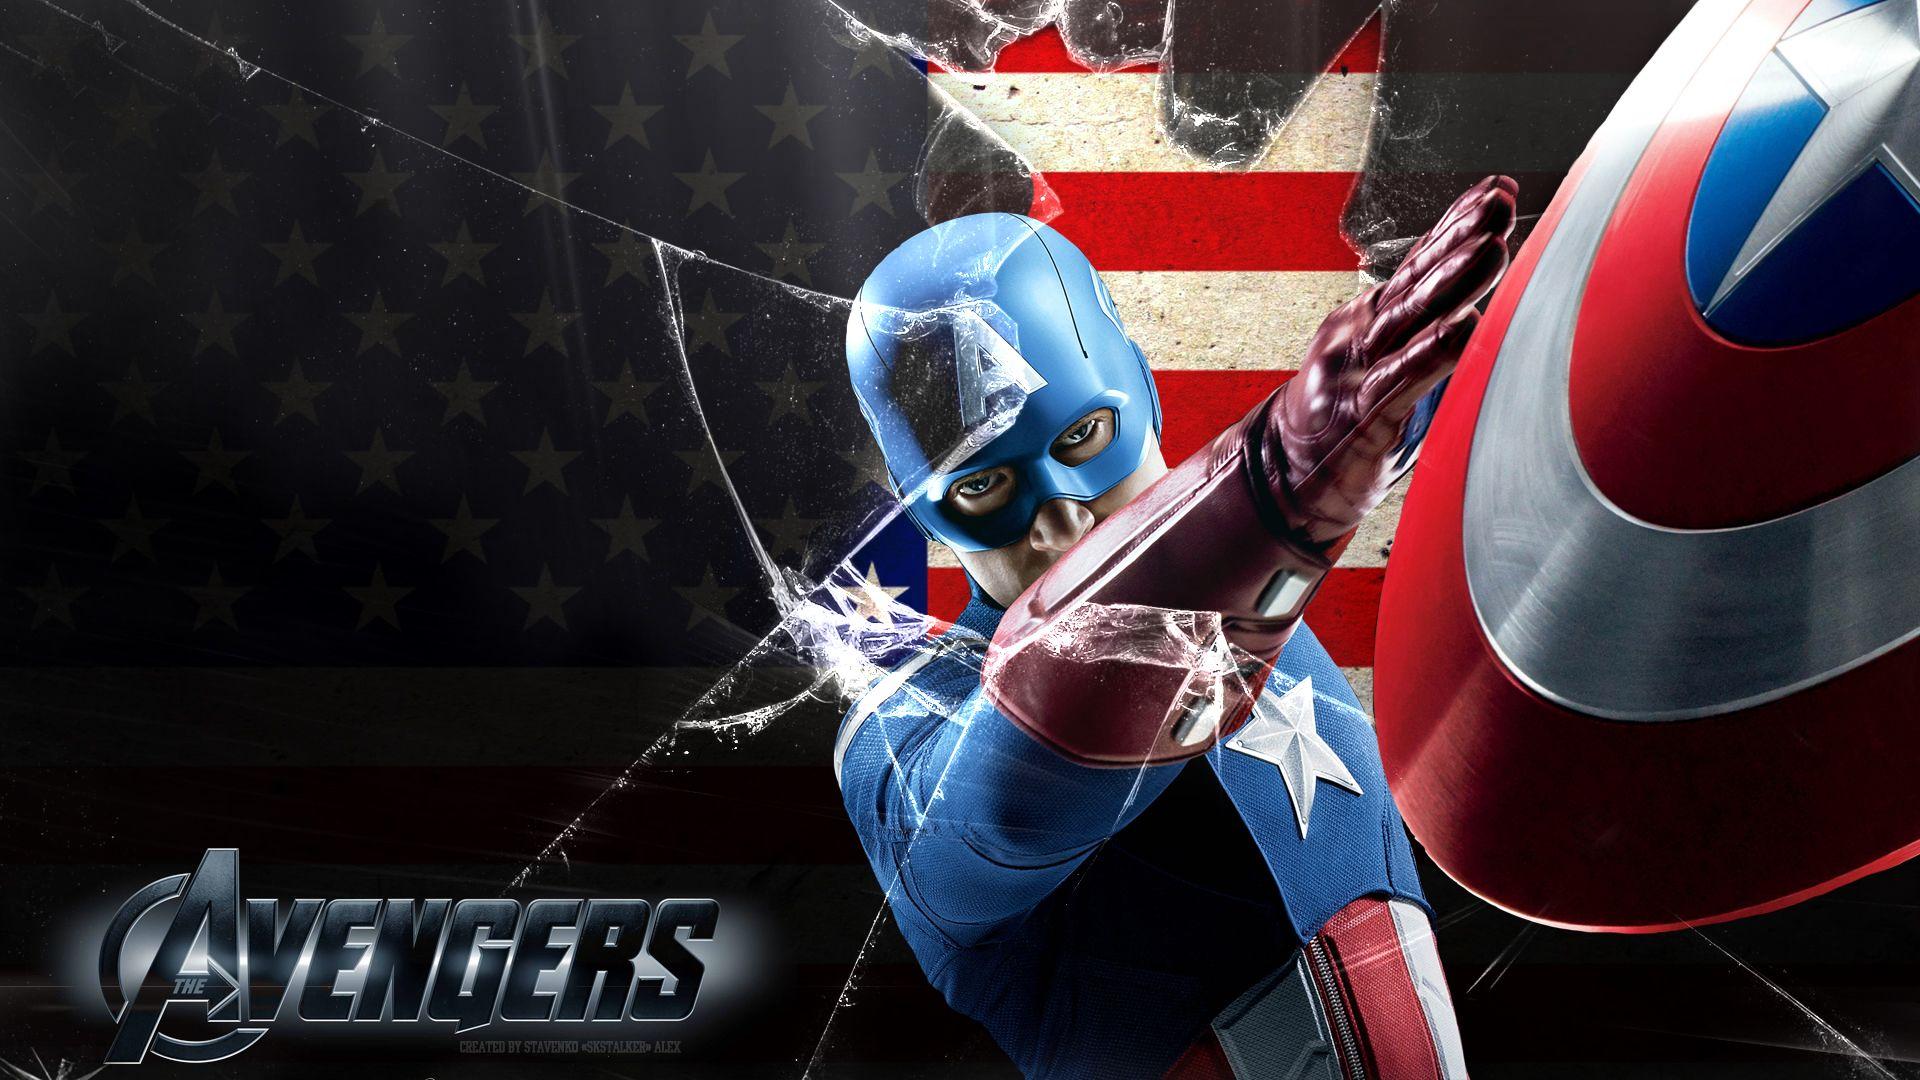 Avengers Captain America Wallpaper 1080p By Skstalker Deviantart Com On Deviantart Captain America Wallpaper Avengers Wallpaper Captain America 1080p full hd 1080p captain america hd